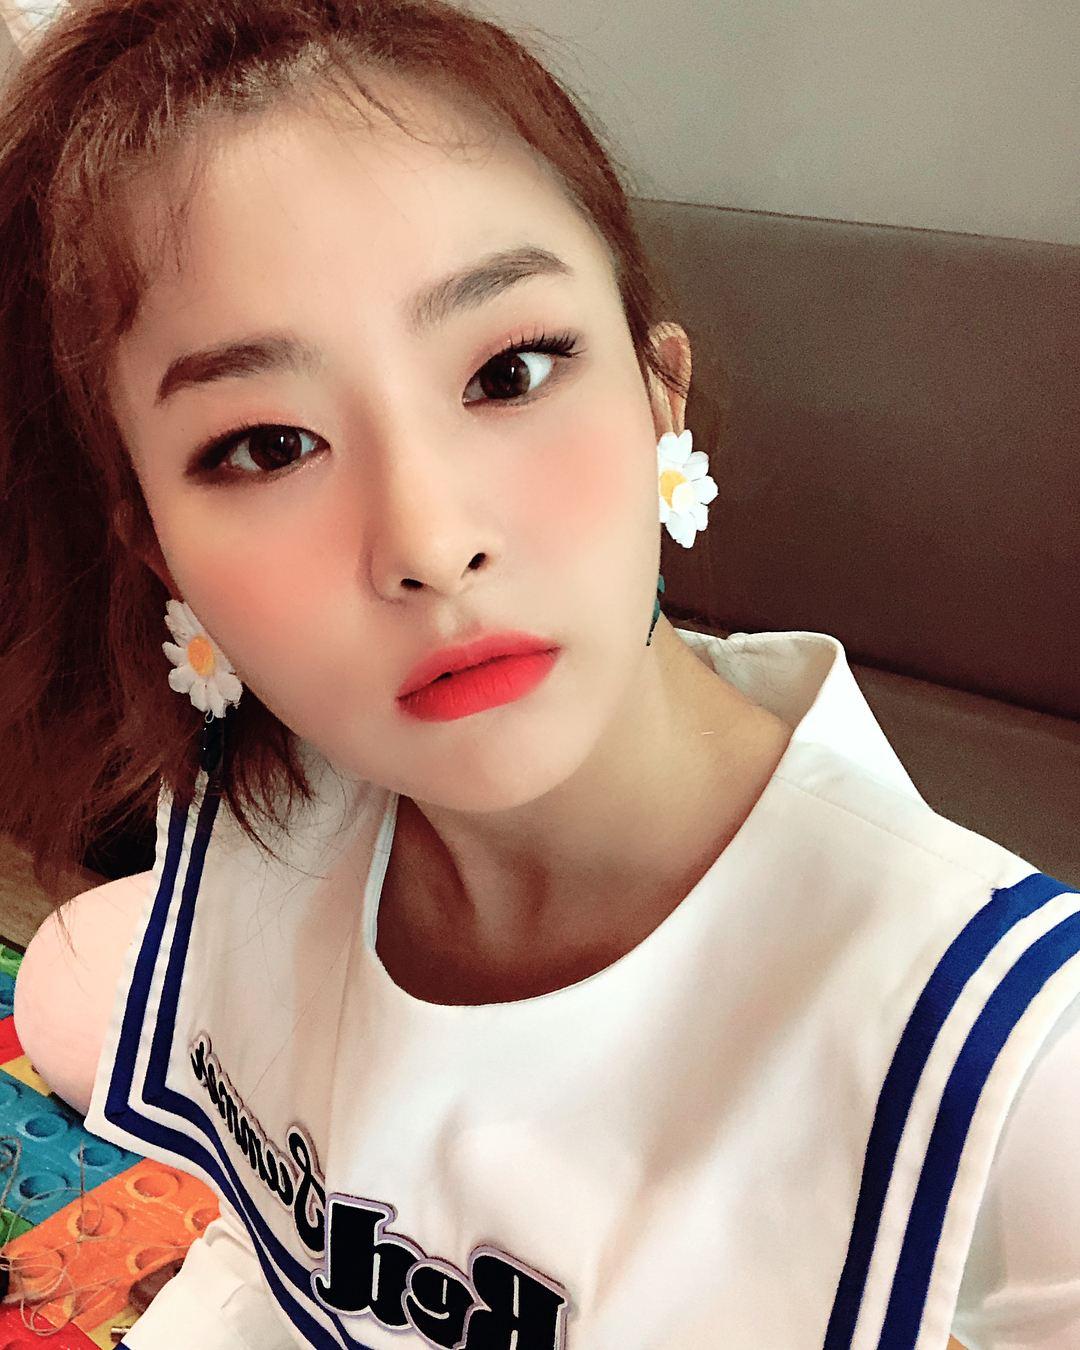 # Red Velvet - SEULGI 除了Irene之外瑟琪在練習生時期也很出名,而最有名的事蹟當然還是SJ前輩圭賢在節目上提到SM裡有個還沒出道的練習生叫瑟琪,不僅誇獎瑟琪可愛也說她很有才華。